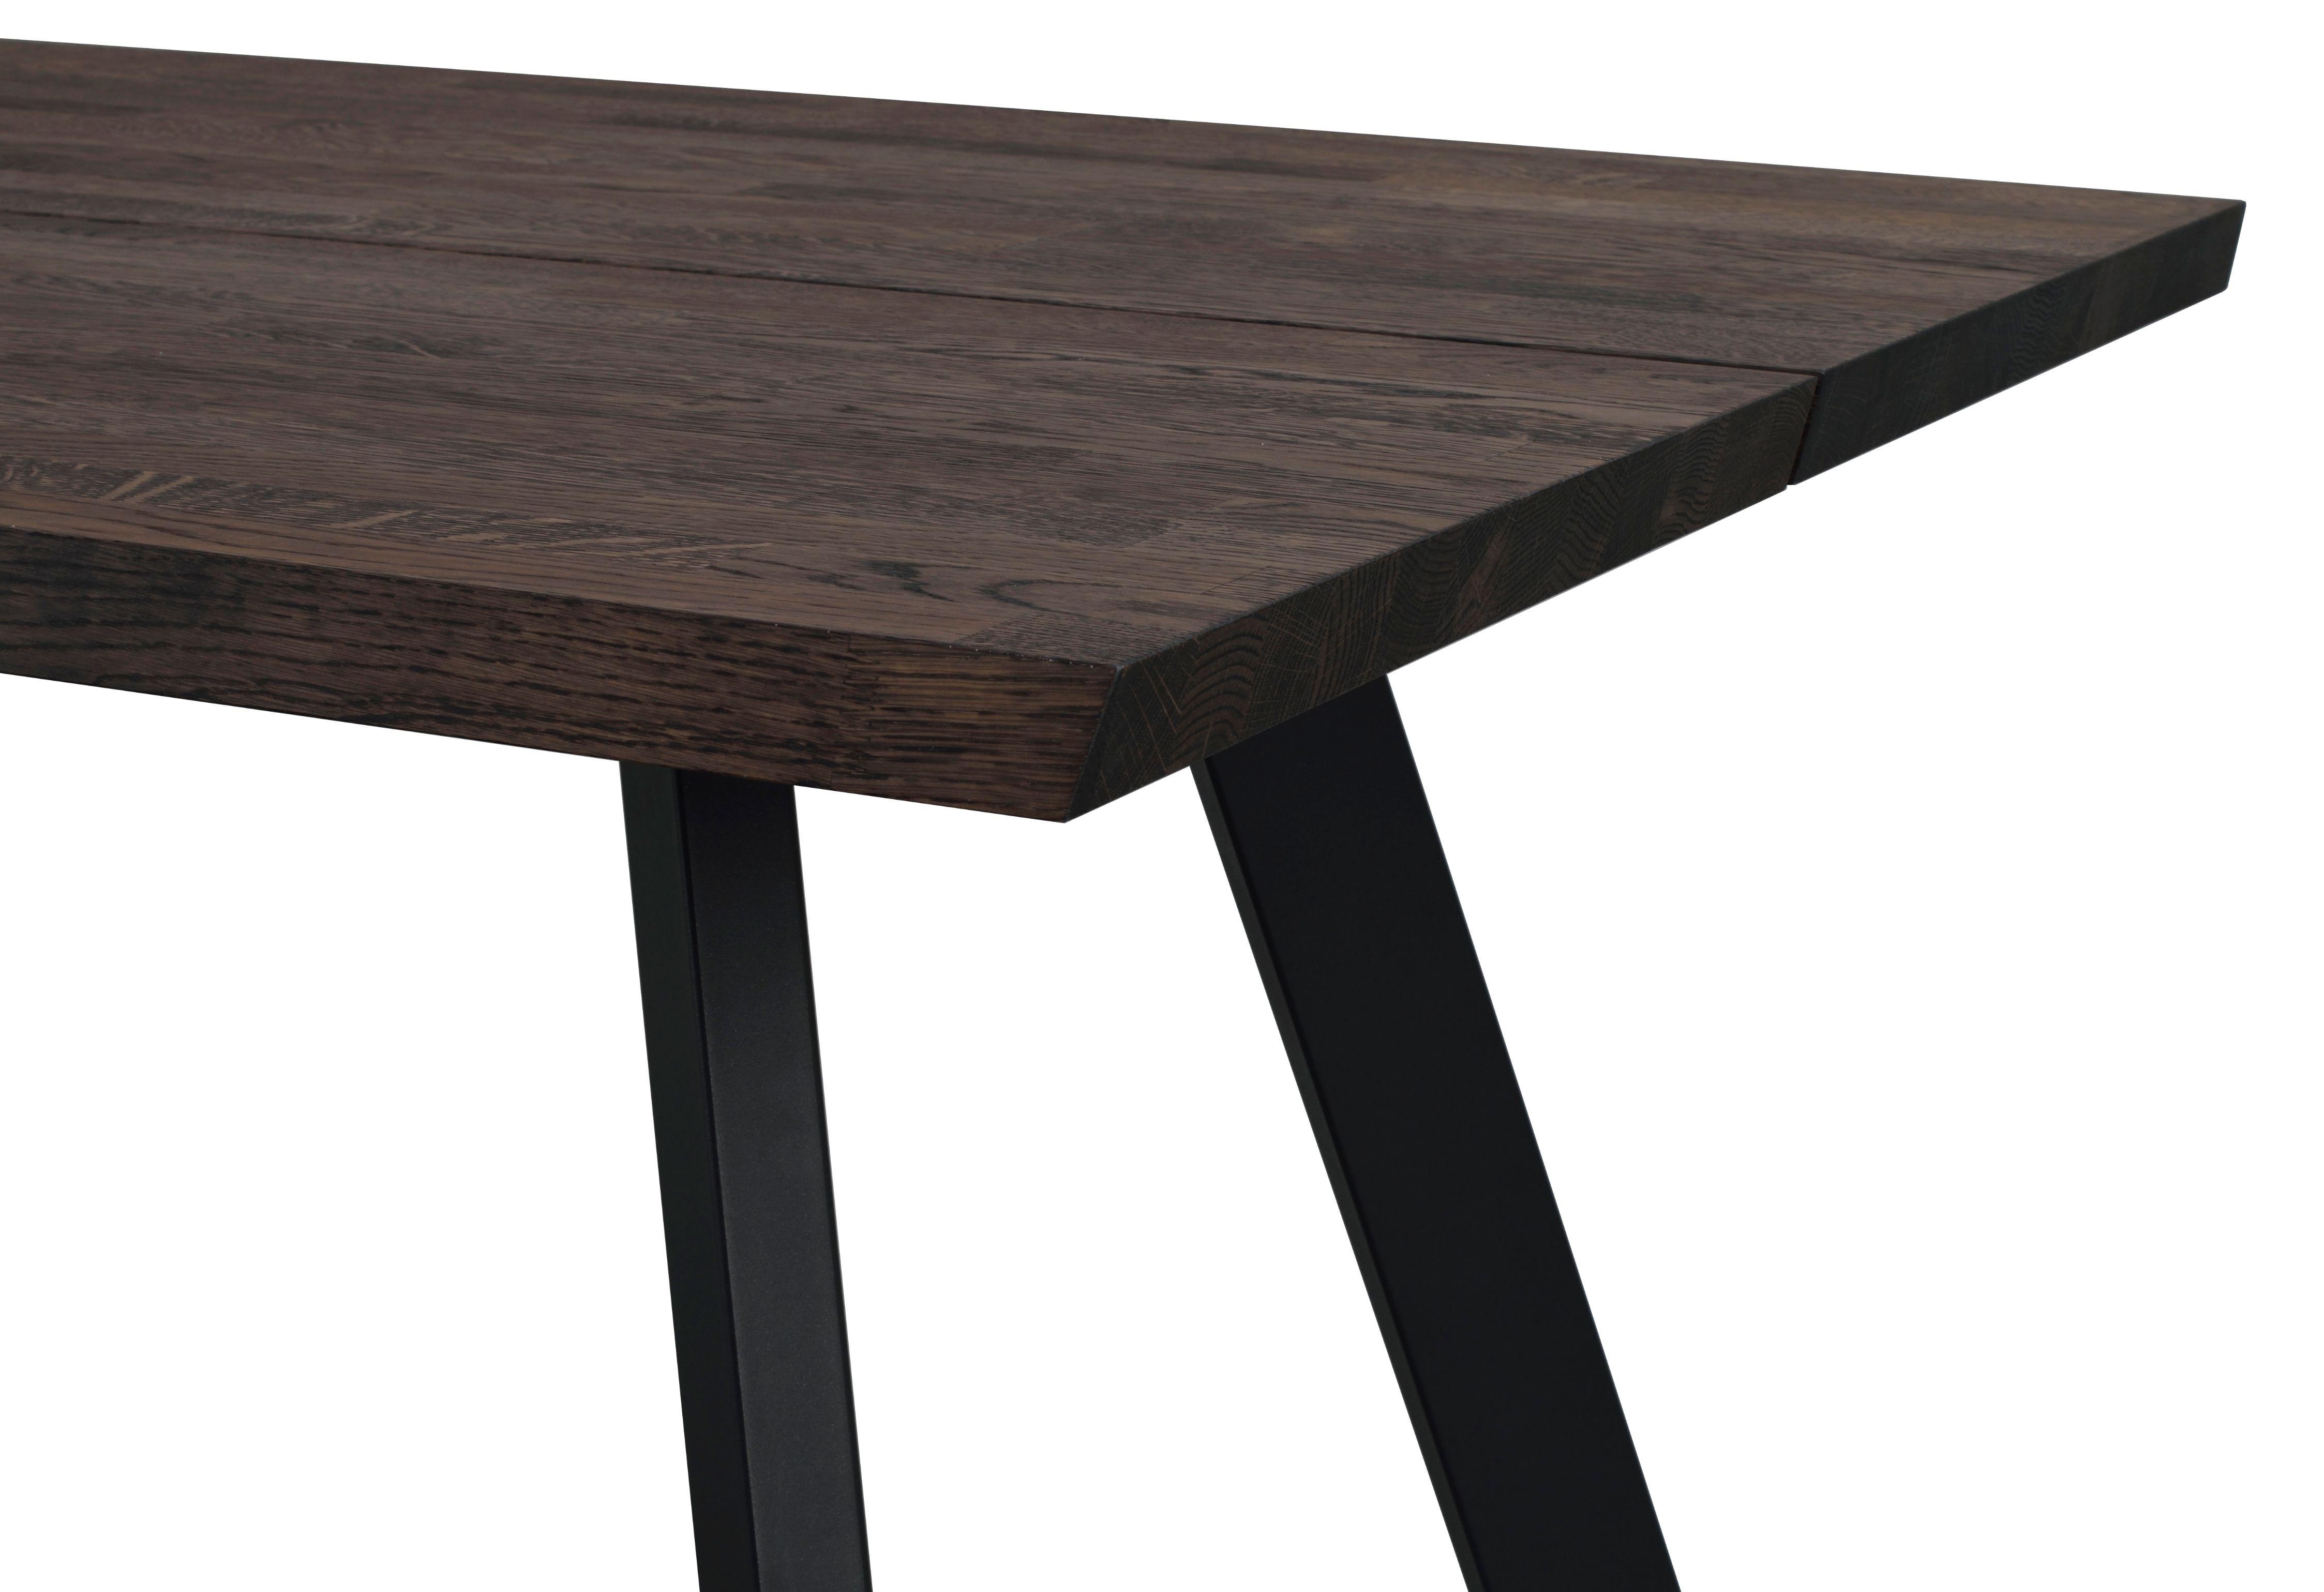 FRED DARK OAK 170 cm Dining Table